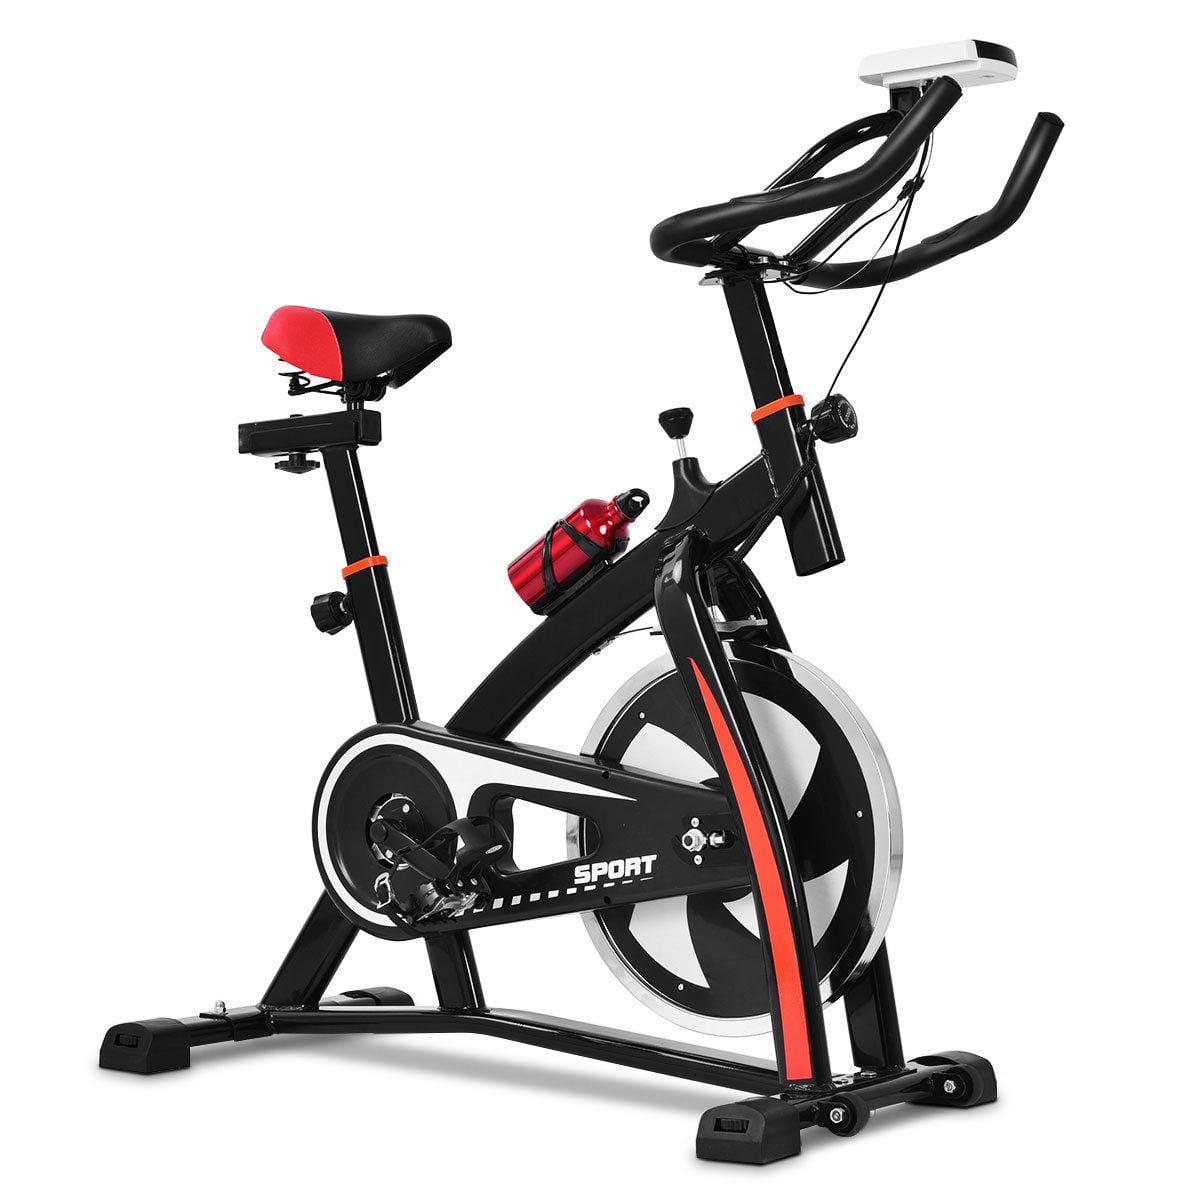 Costway Indoor Cycling Exercise Bike